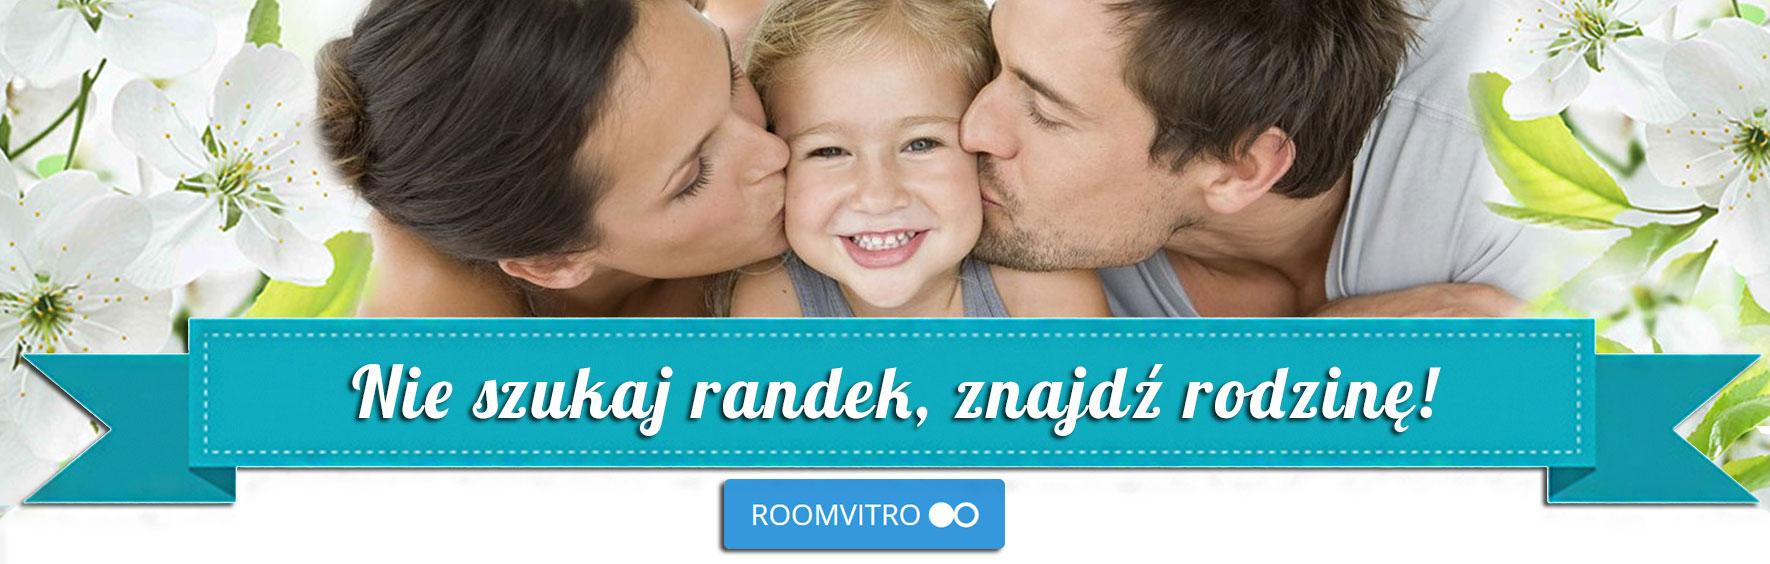 Uspione dziecko online dating